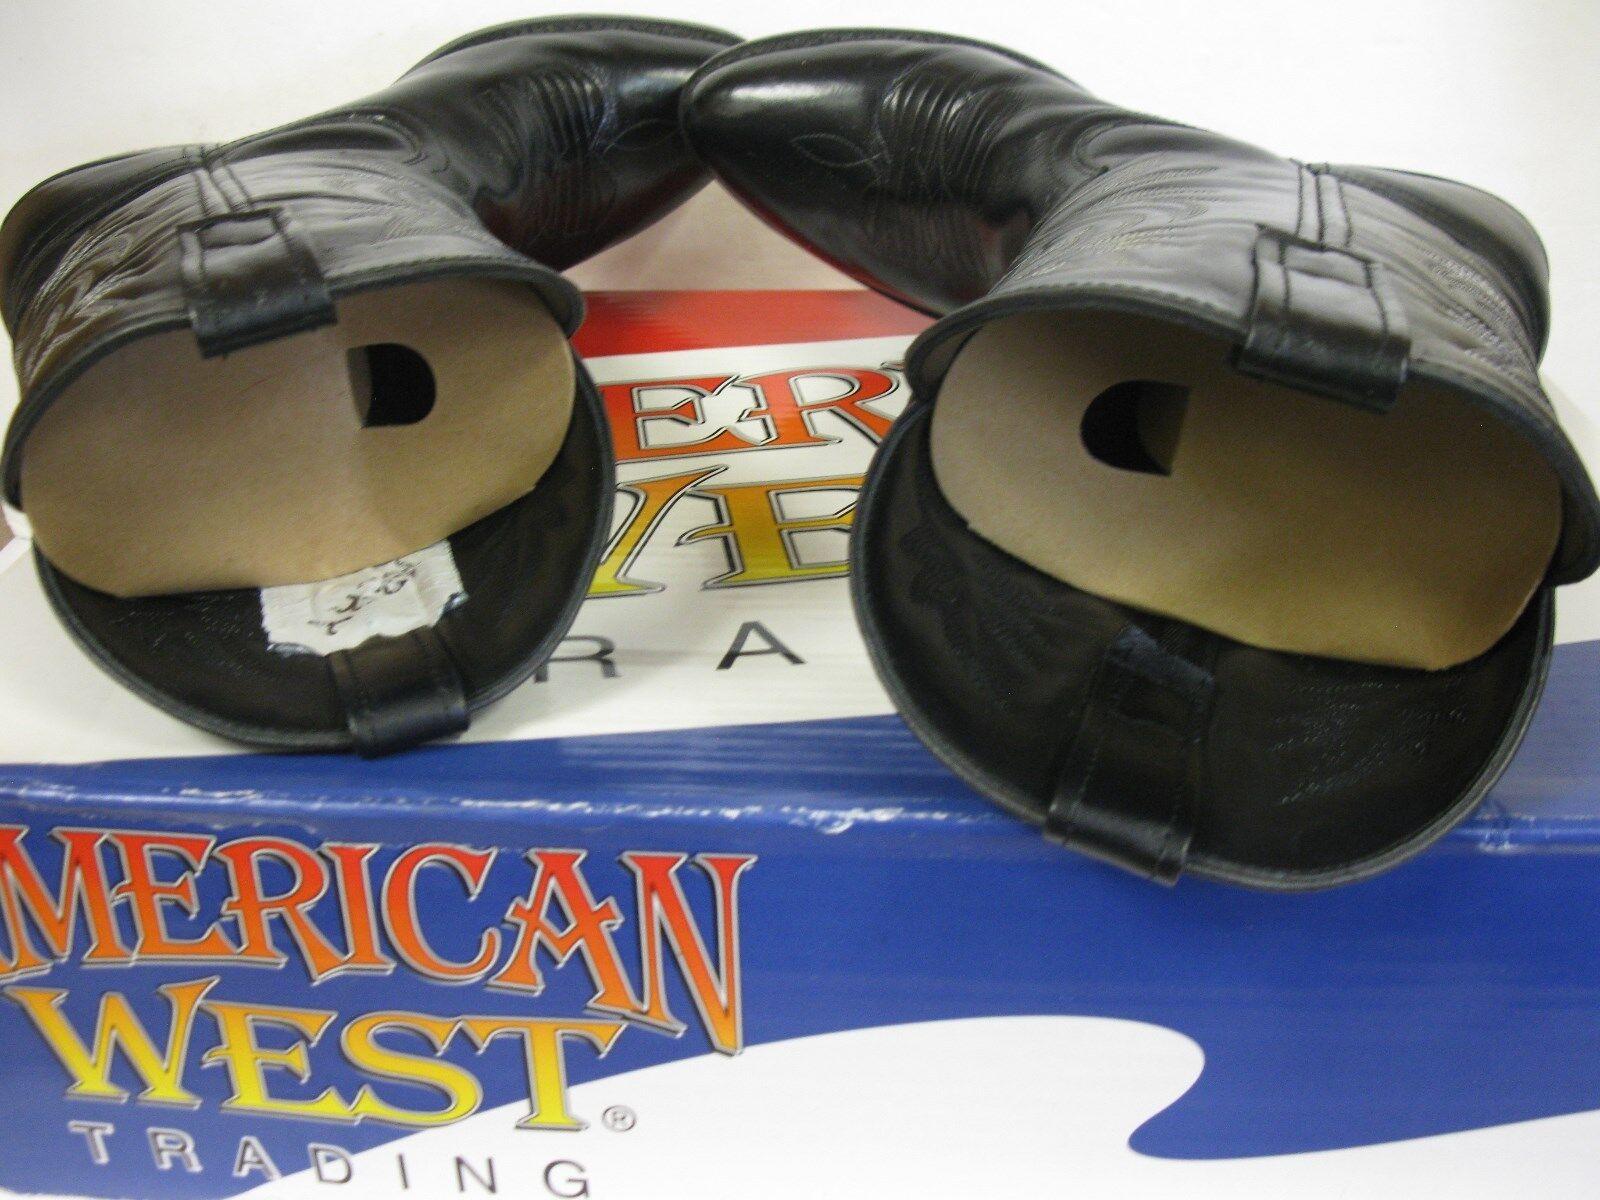 American West 4210 Trading 4210 West Men's Black London Western Boots Size 9.5EU 67797a